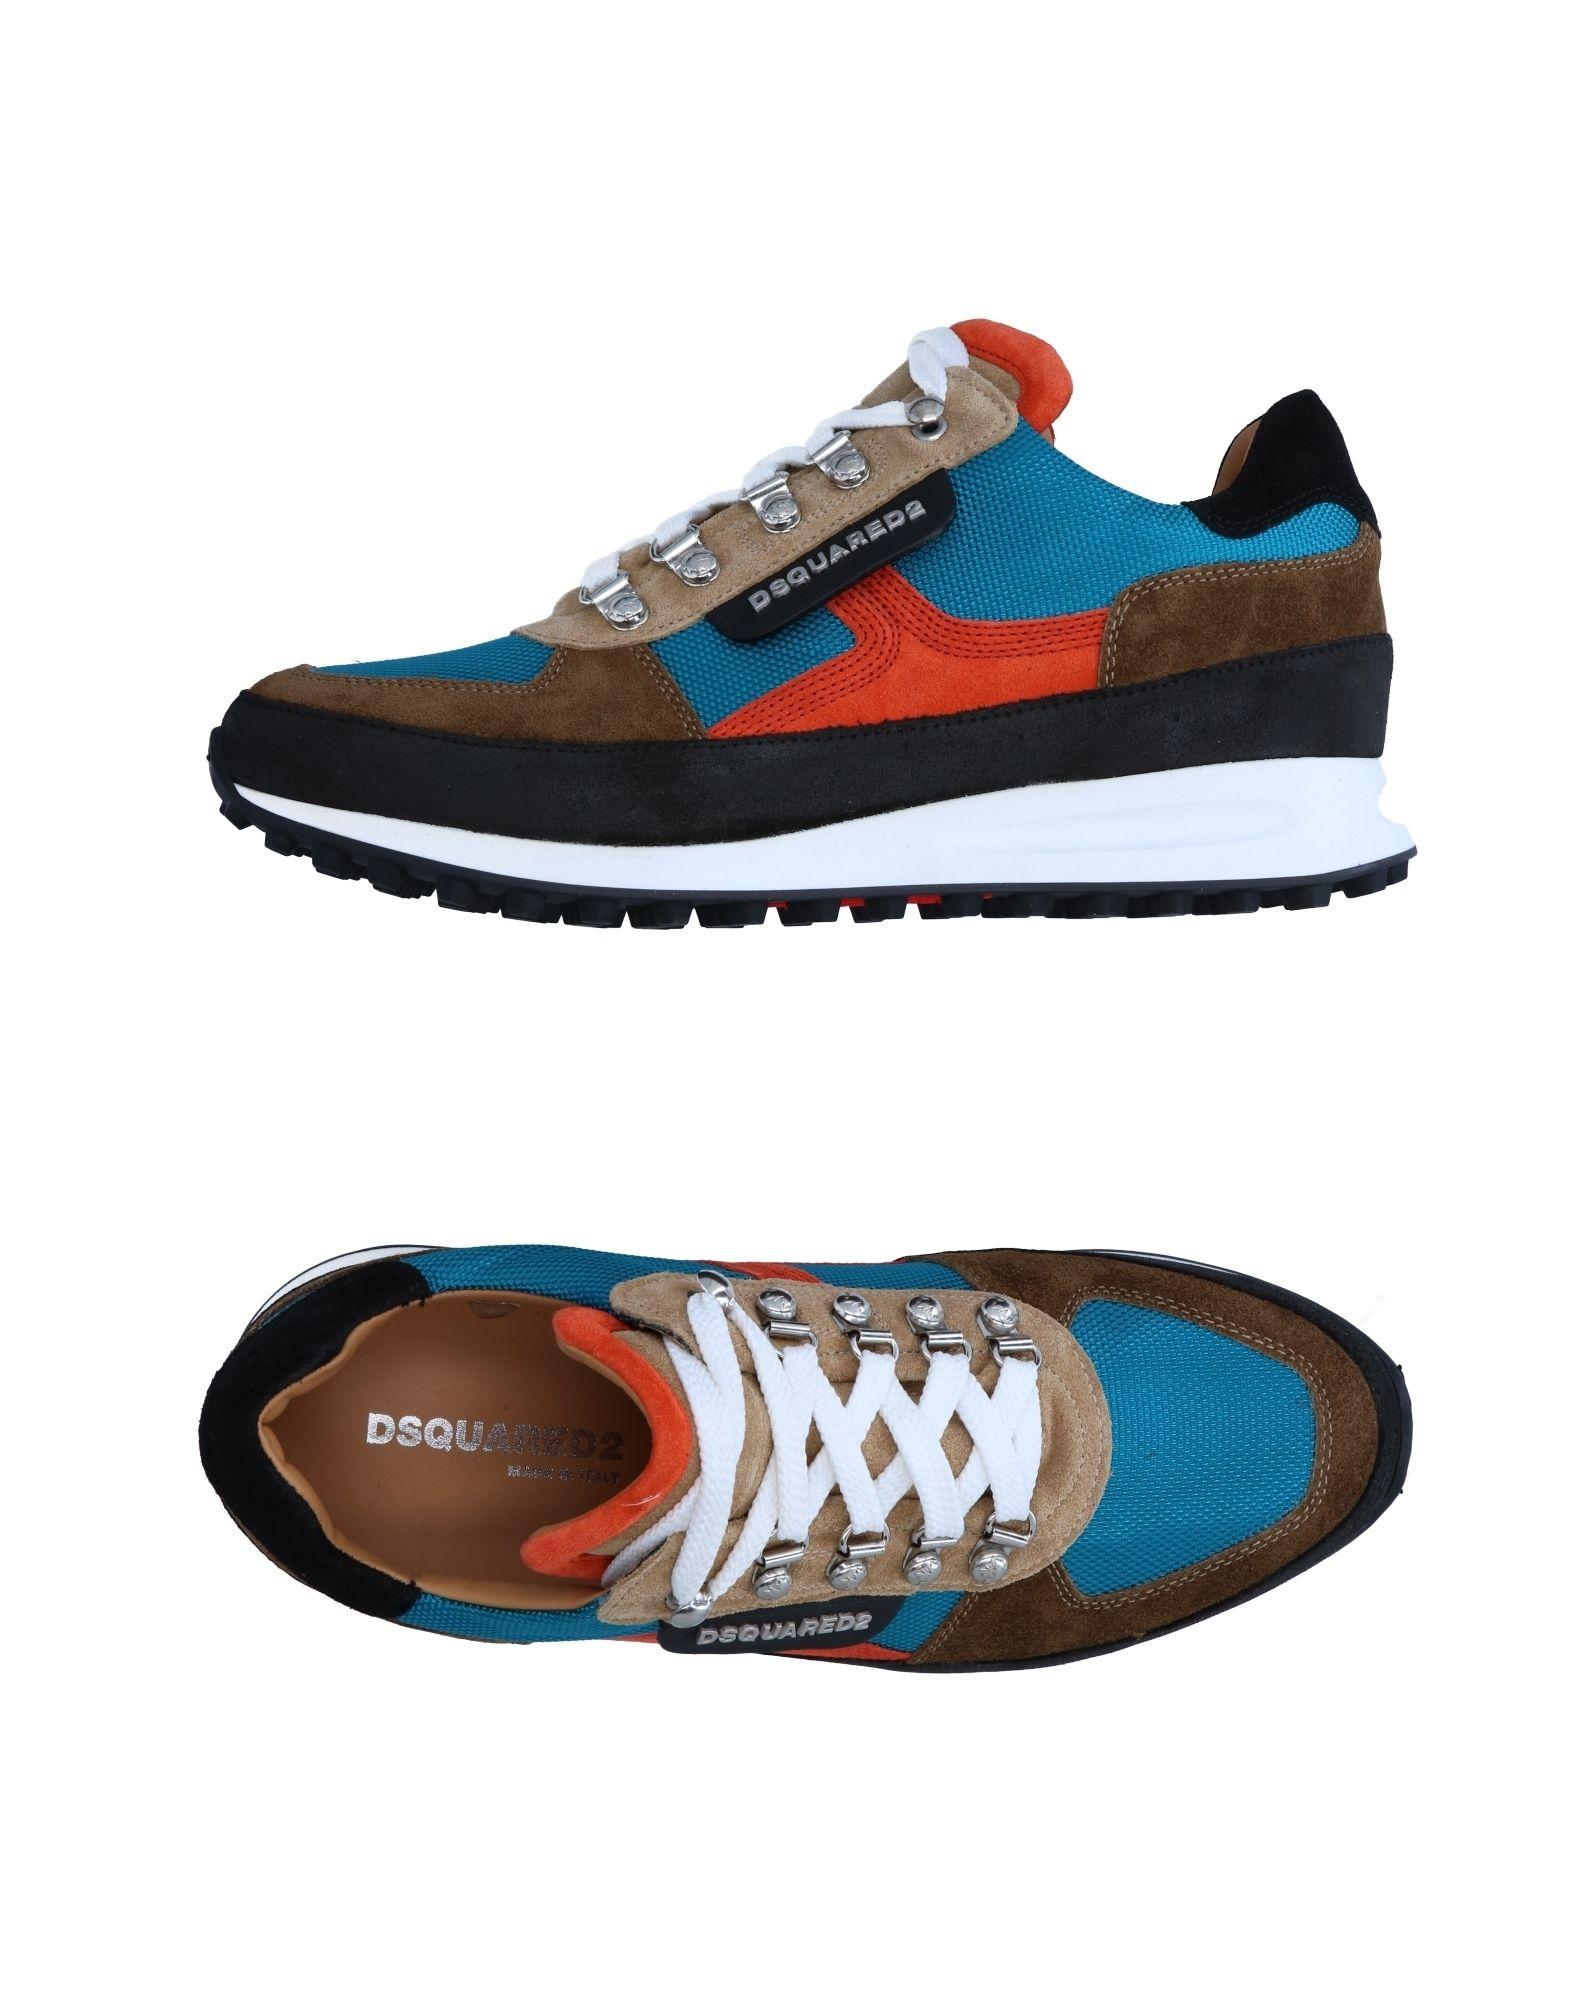 Dsquared2 Sneakers Herren  11246343BU Gute Qualität beliebte Schuhe